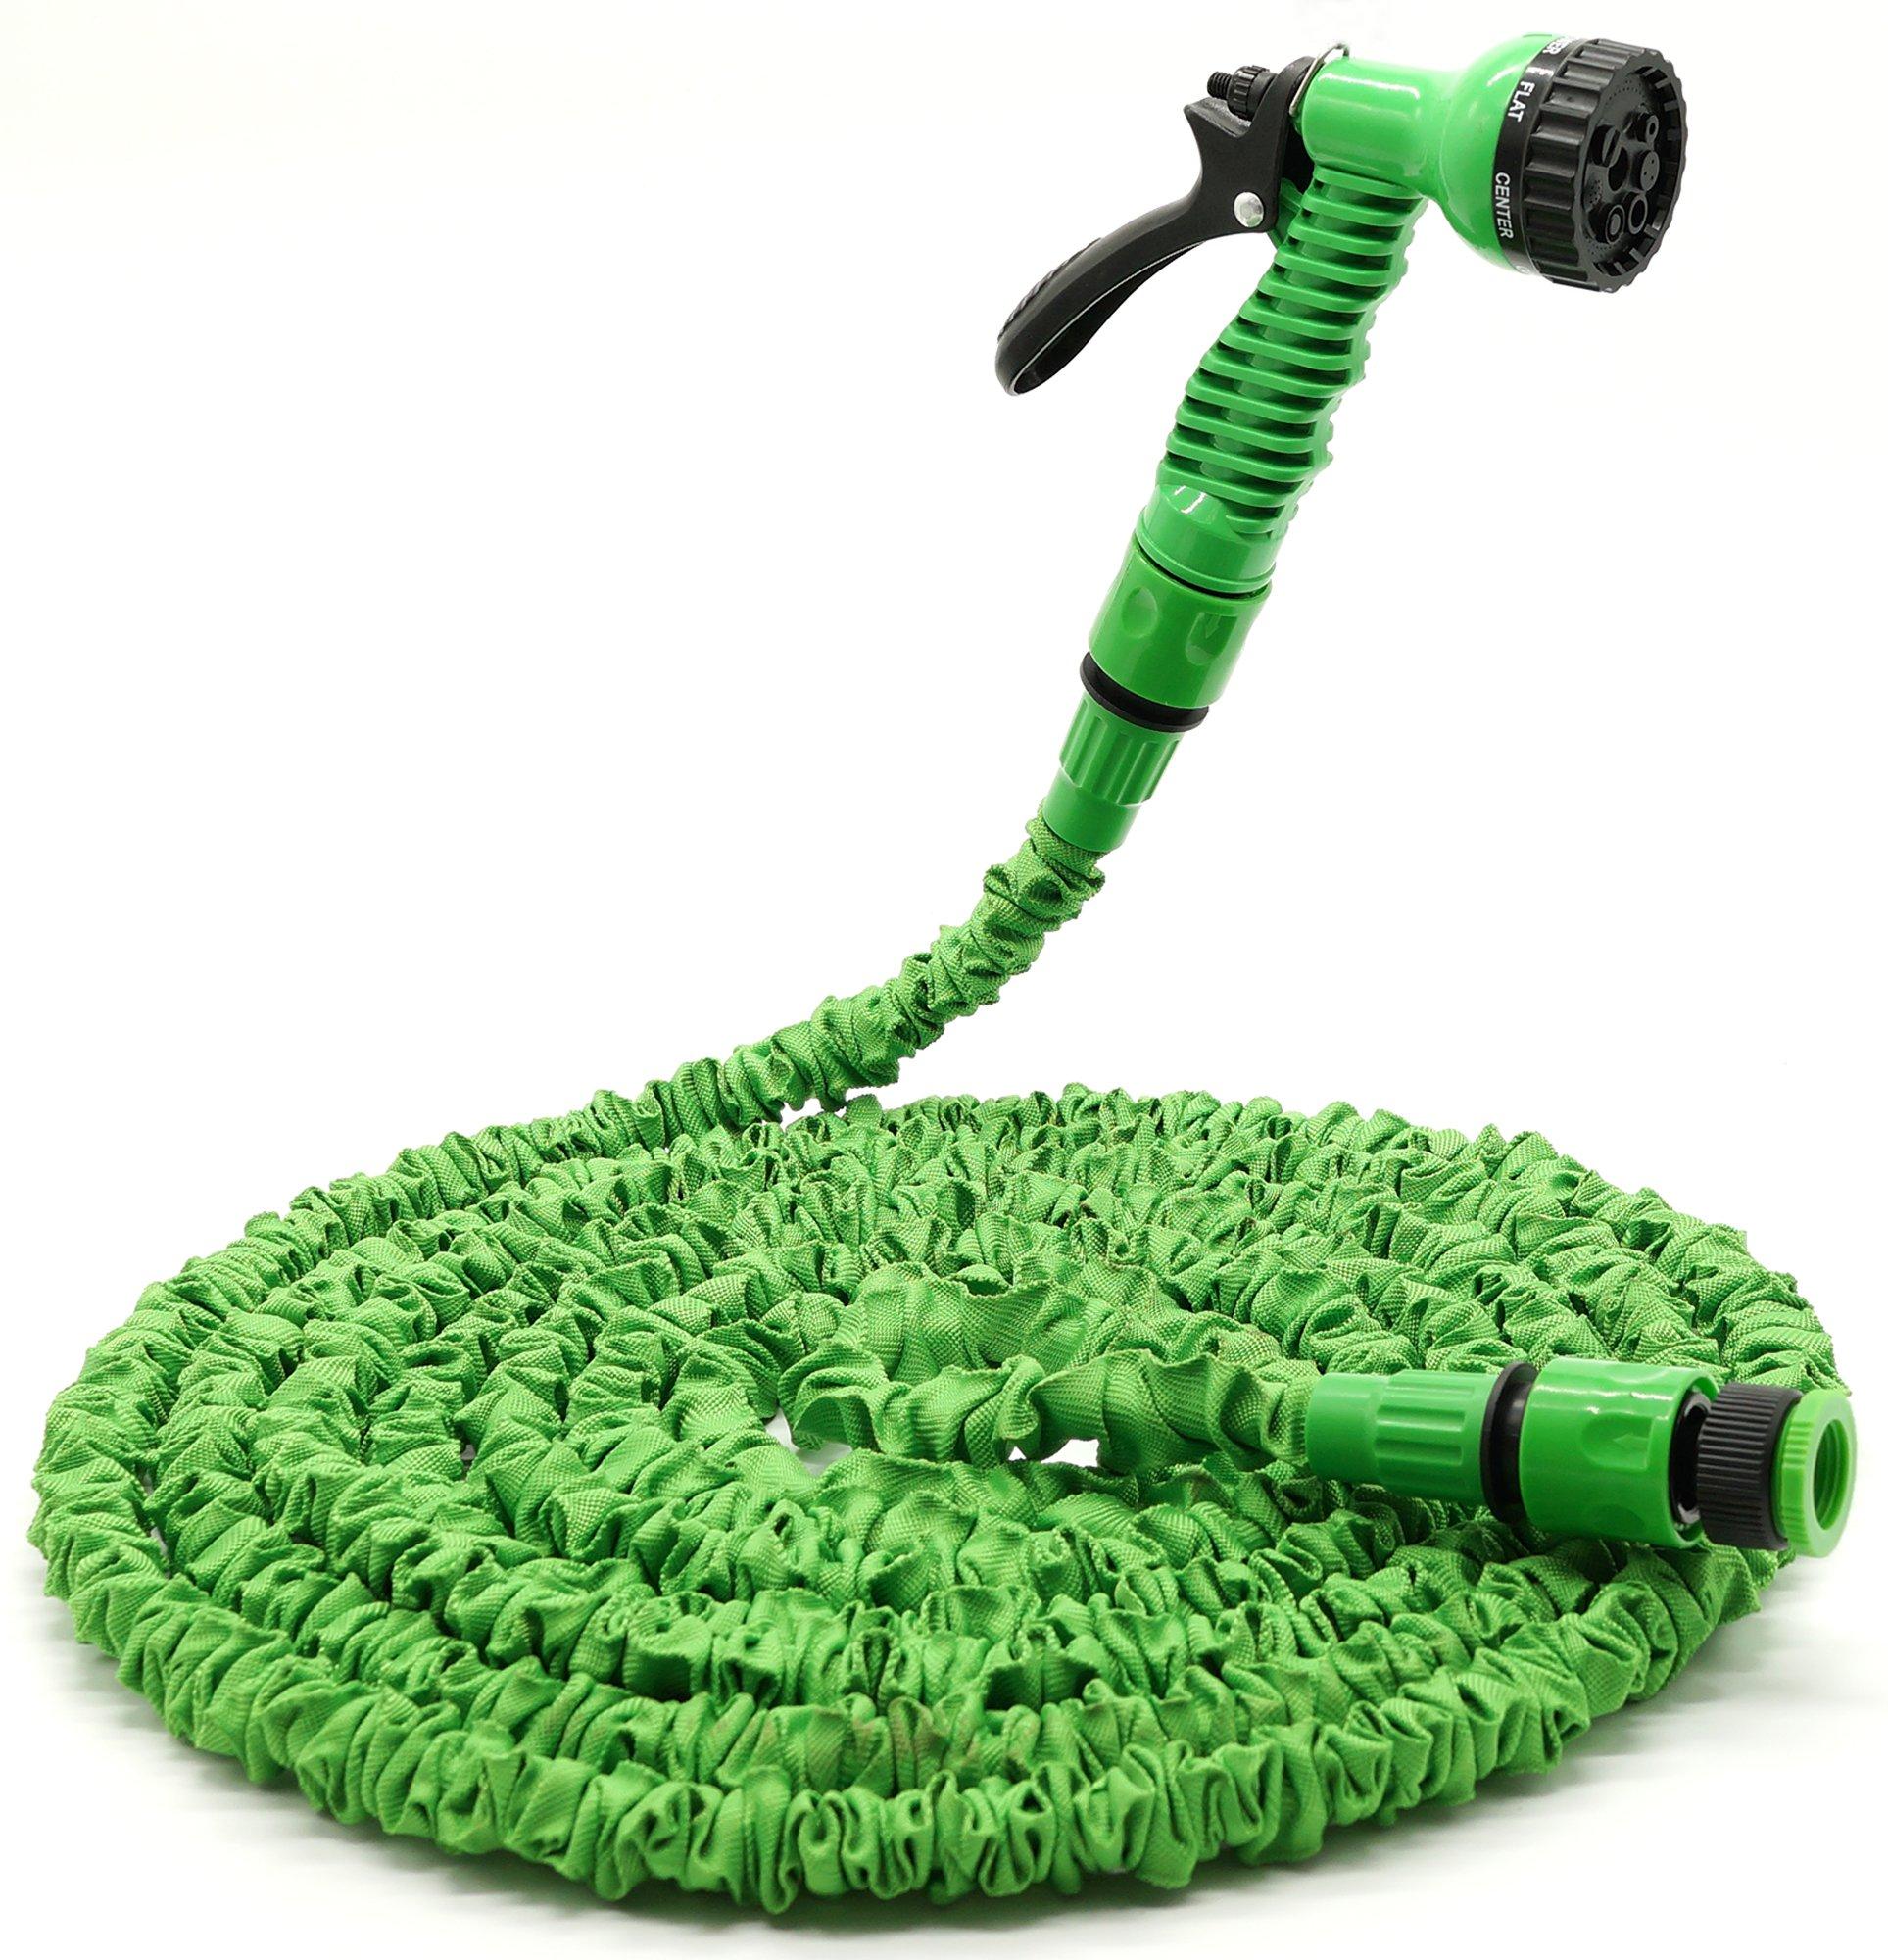 herzo expert no kink garden hose pipe pampered gardens best magic brand new ebay